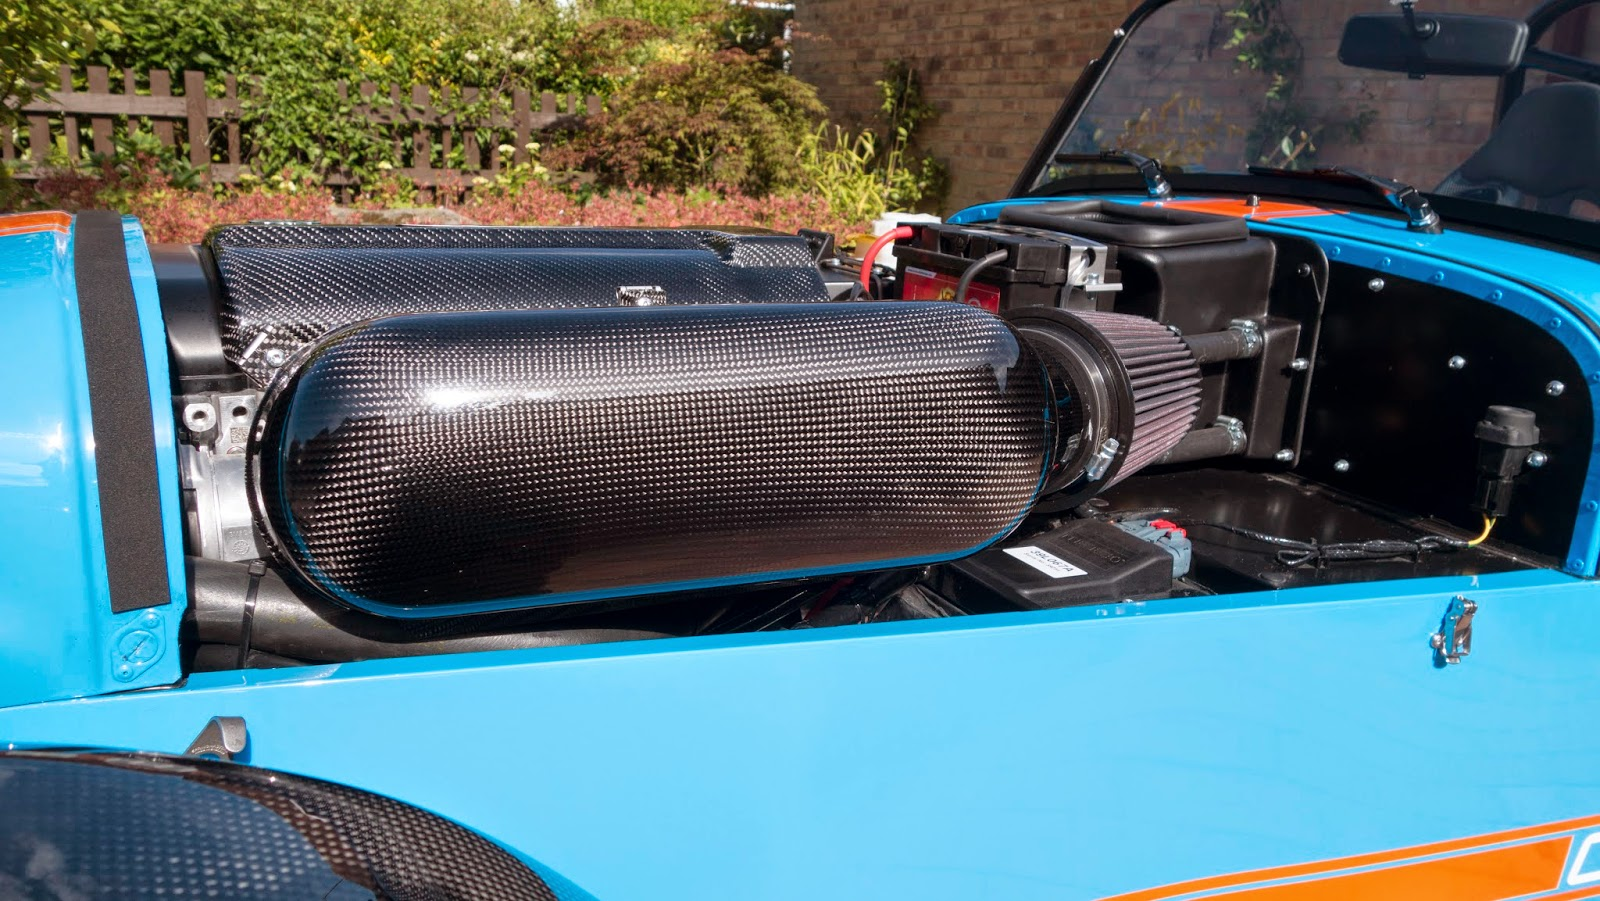 R500 carbon fibre track day air box with k&n air filter.